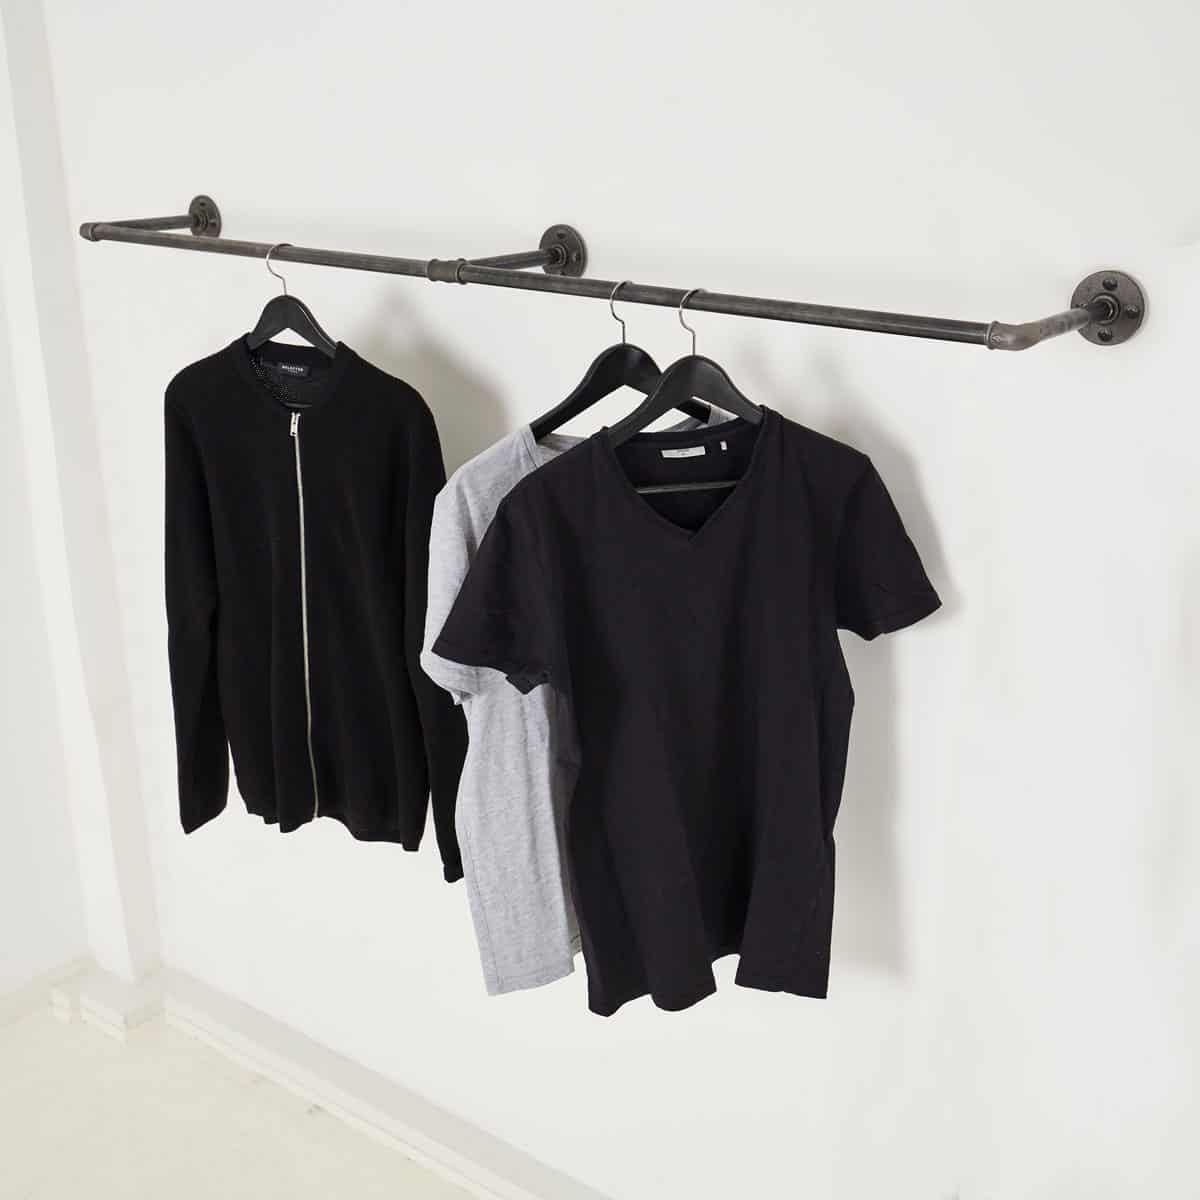 Kleiderstange Industrial Design als Wandgarderobe online kaufen